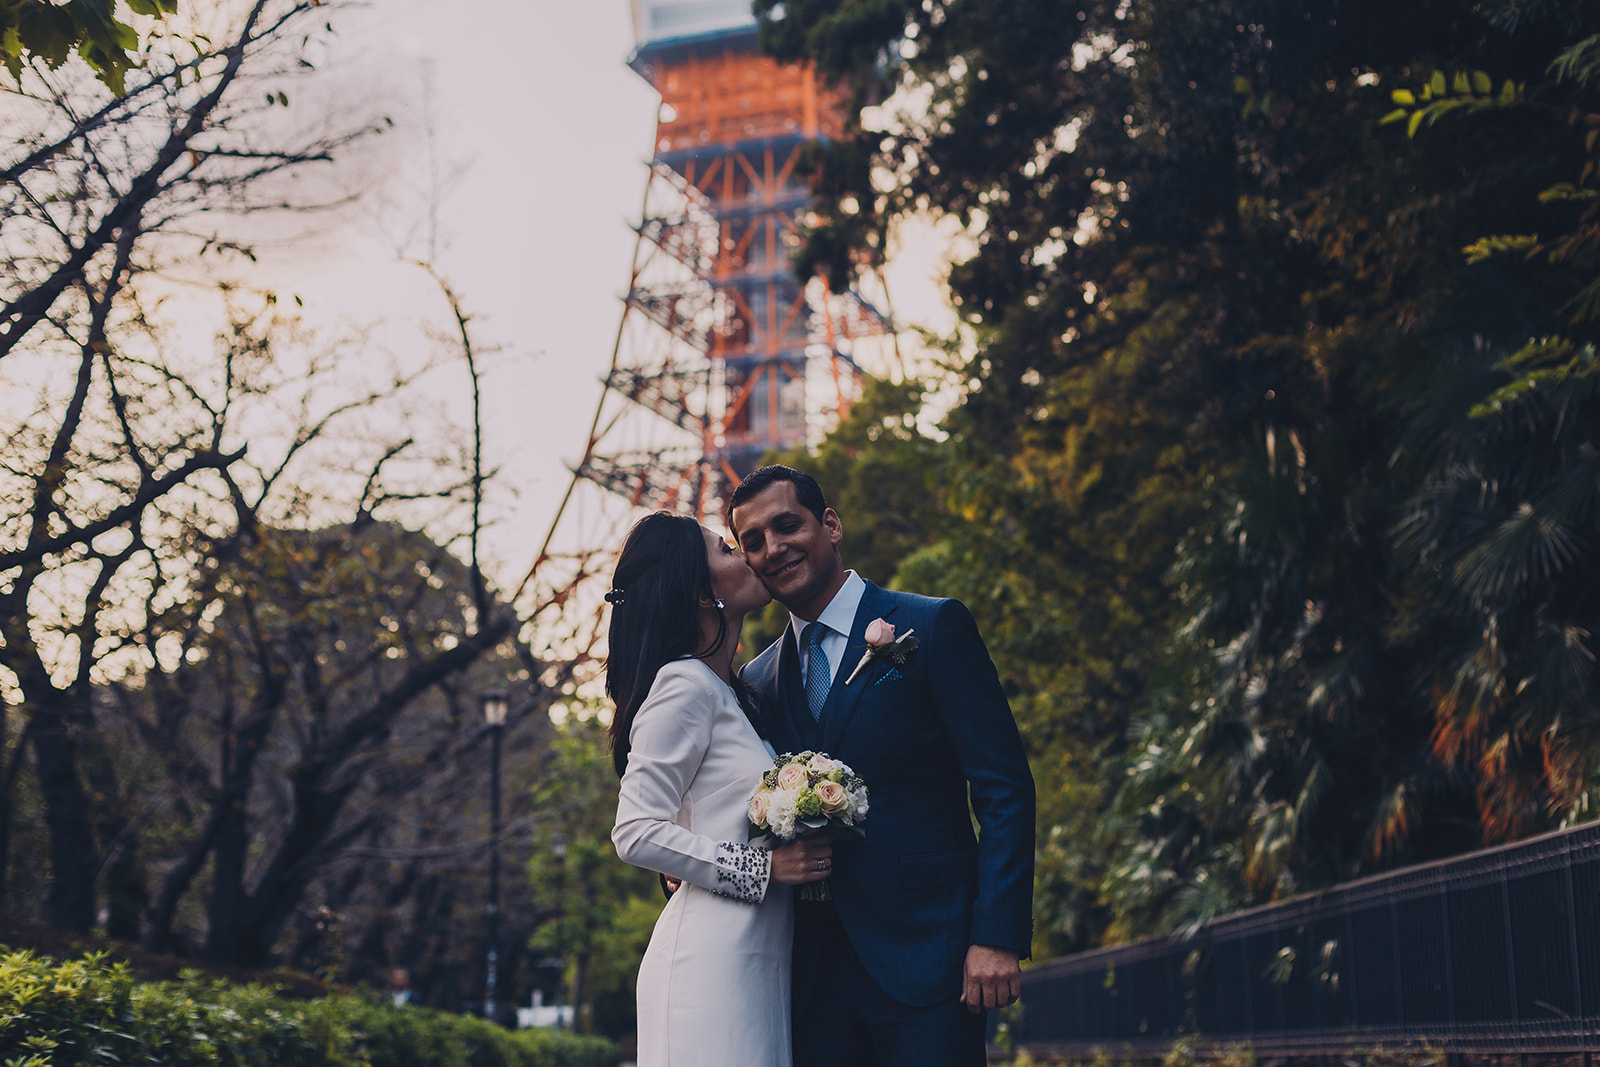 Prewedding pre wedding engagement in Tokyo Japan hire photographer (10).jpg